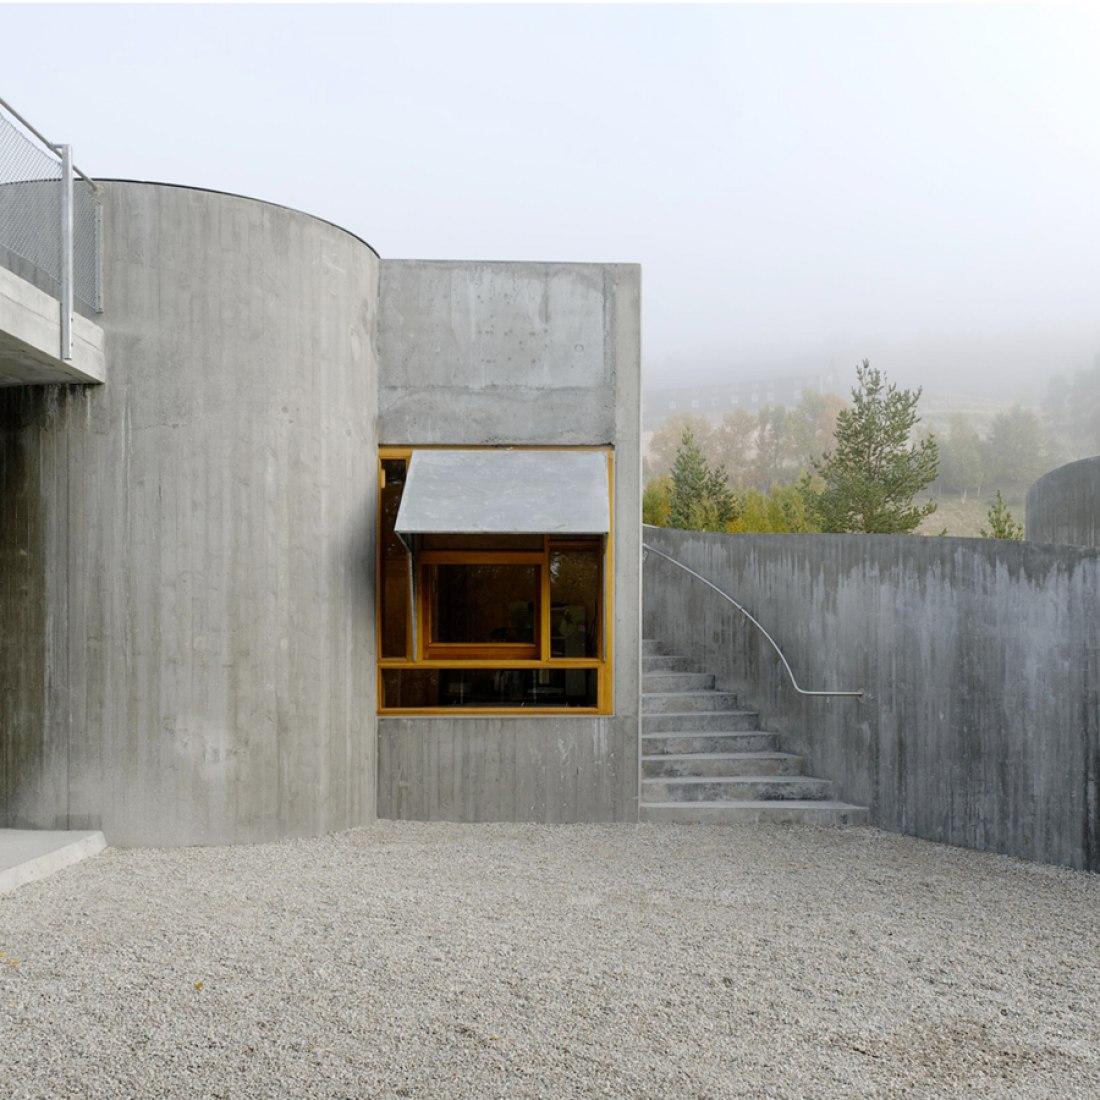 Vista del exterior. Strømbu. Imagen © cortesía de Carl-Viggo Hølmebakk.